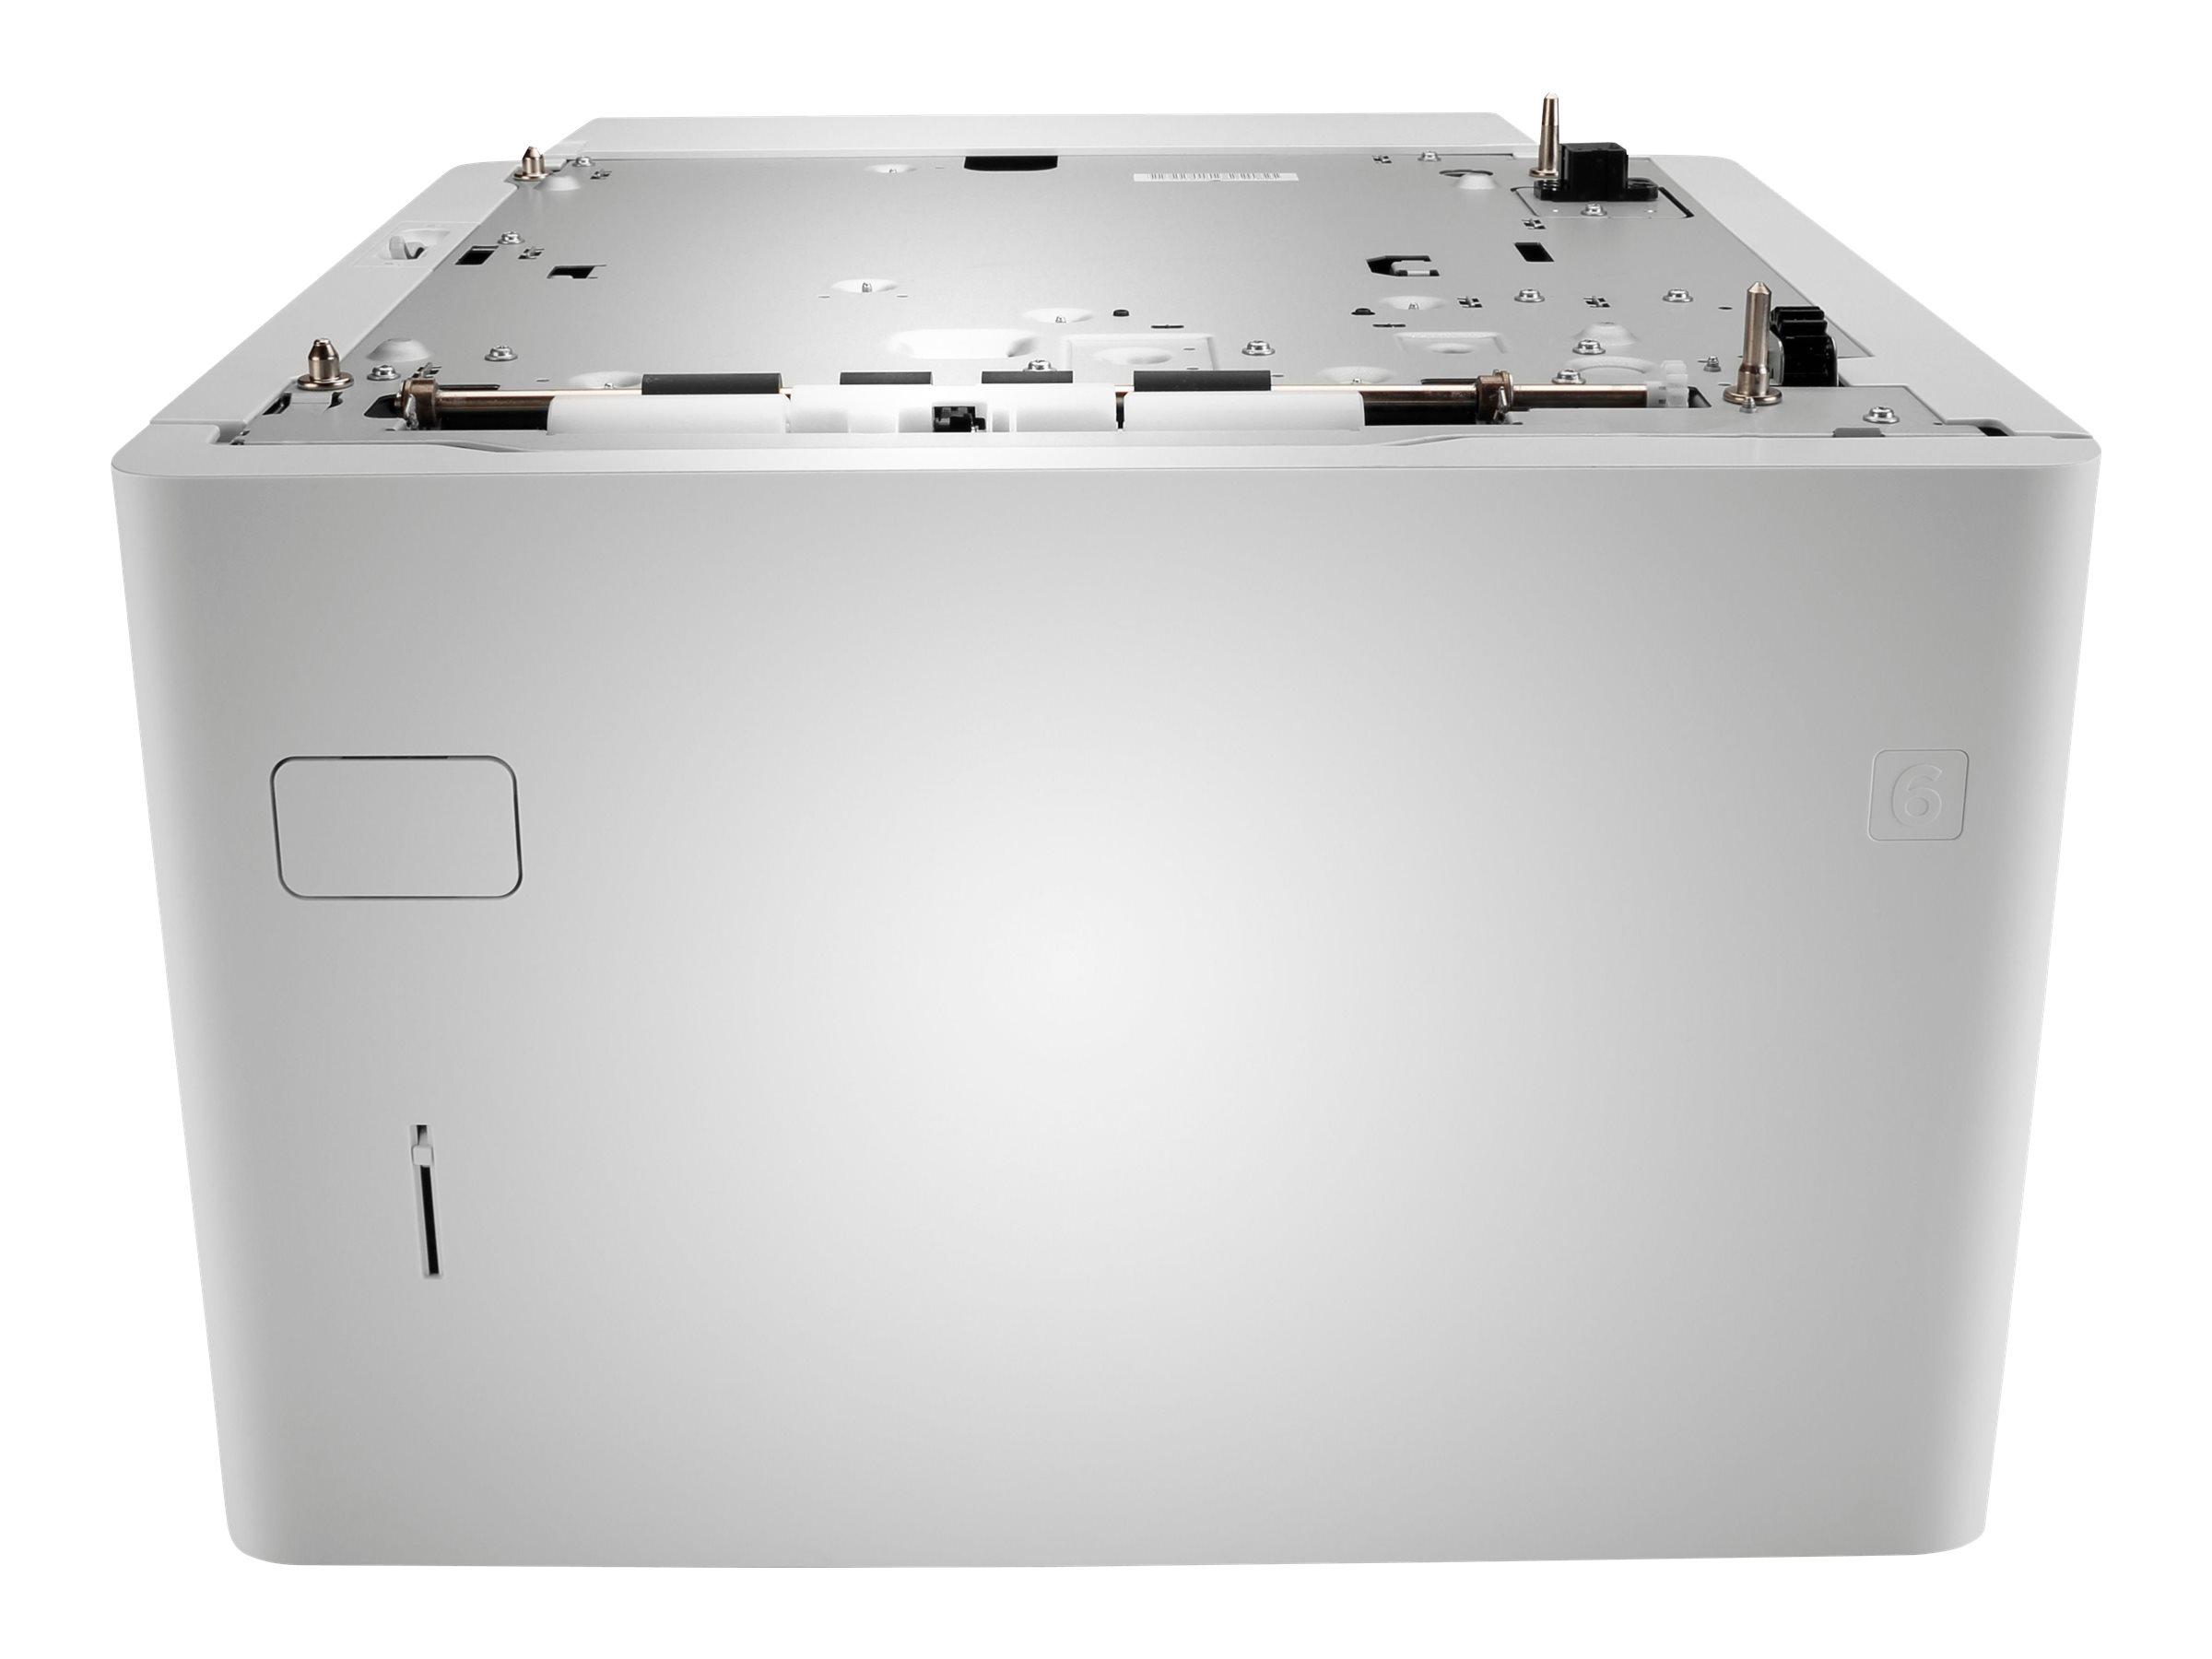 HP Papierzuführung  F2G73A 1500 Blatt für HP LaserJet Enterprise M604/M605 Series